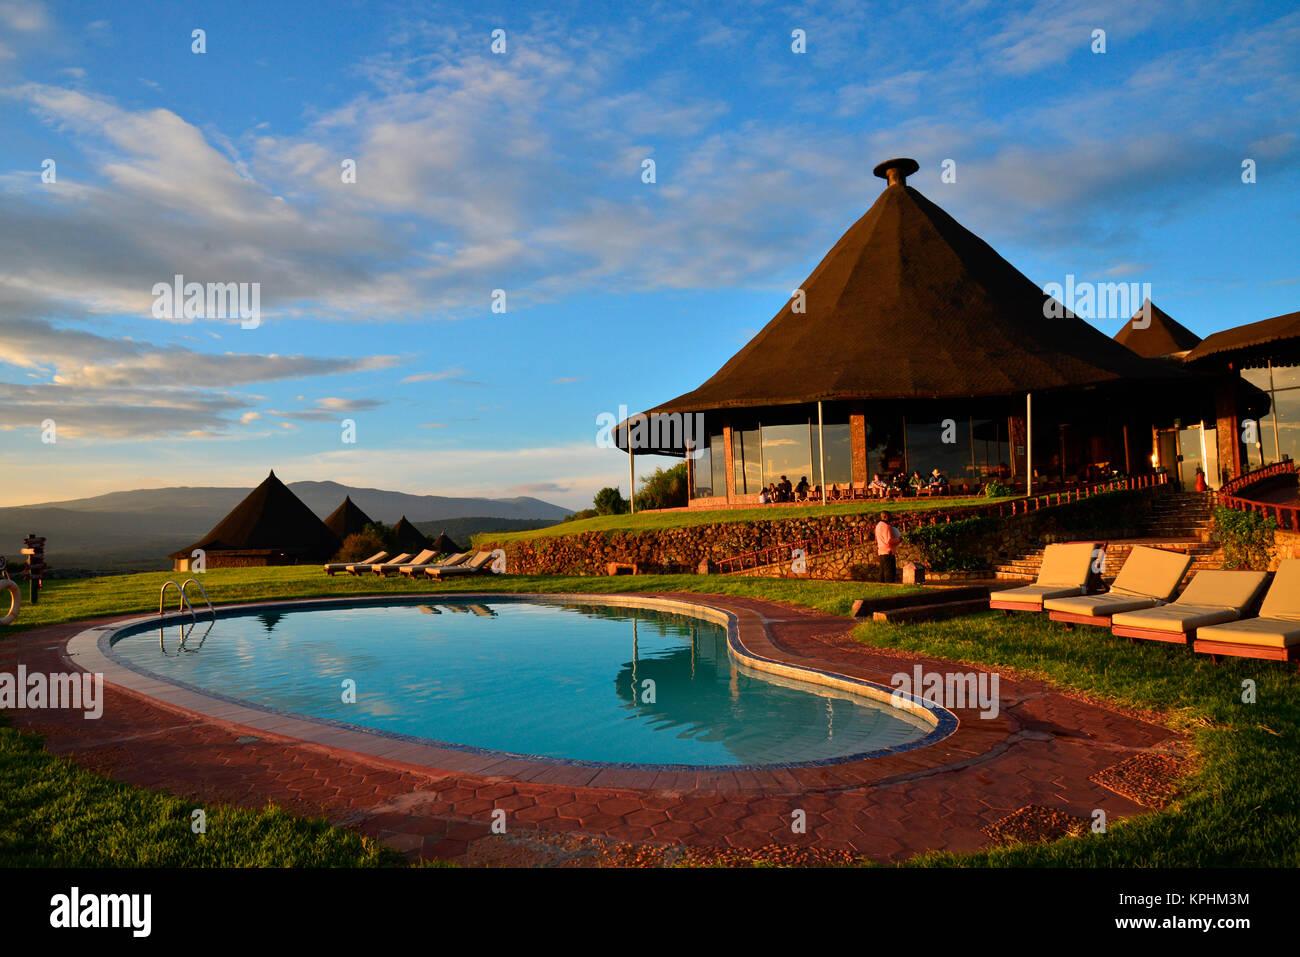 Ngorongoro Sopa Safari lodge and pool, Tanzania Stock Photo